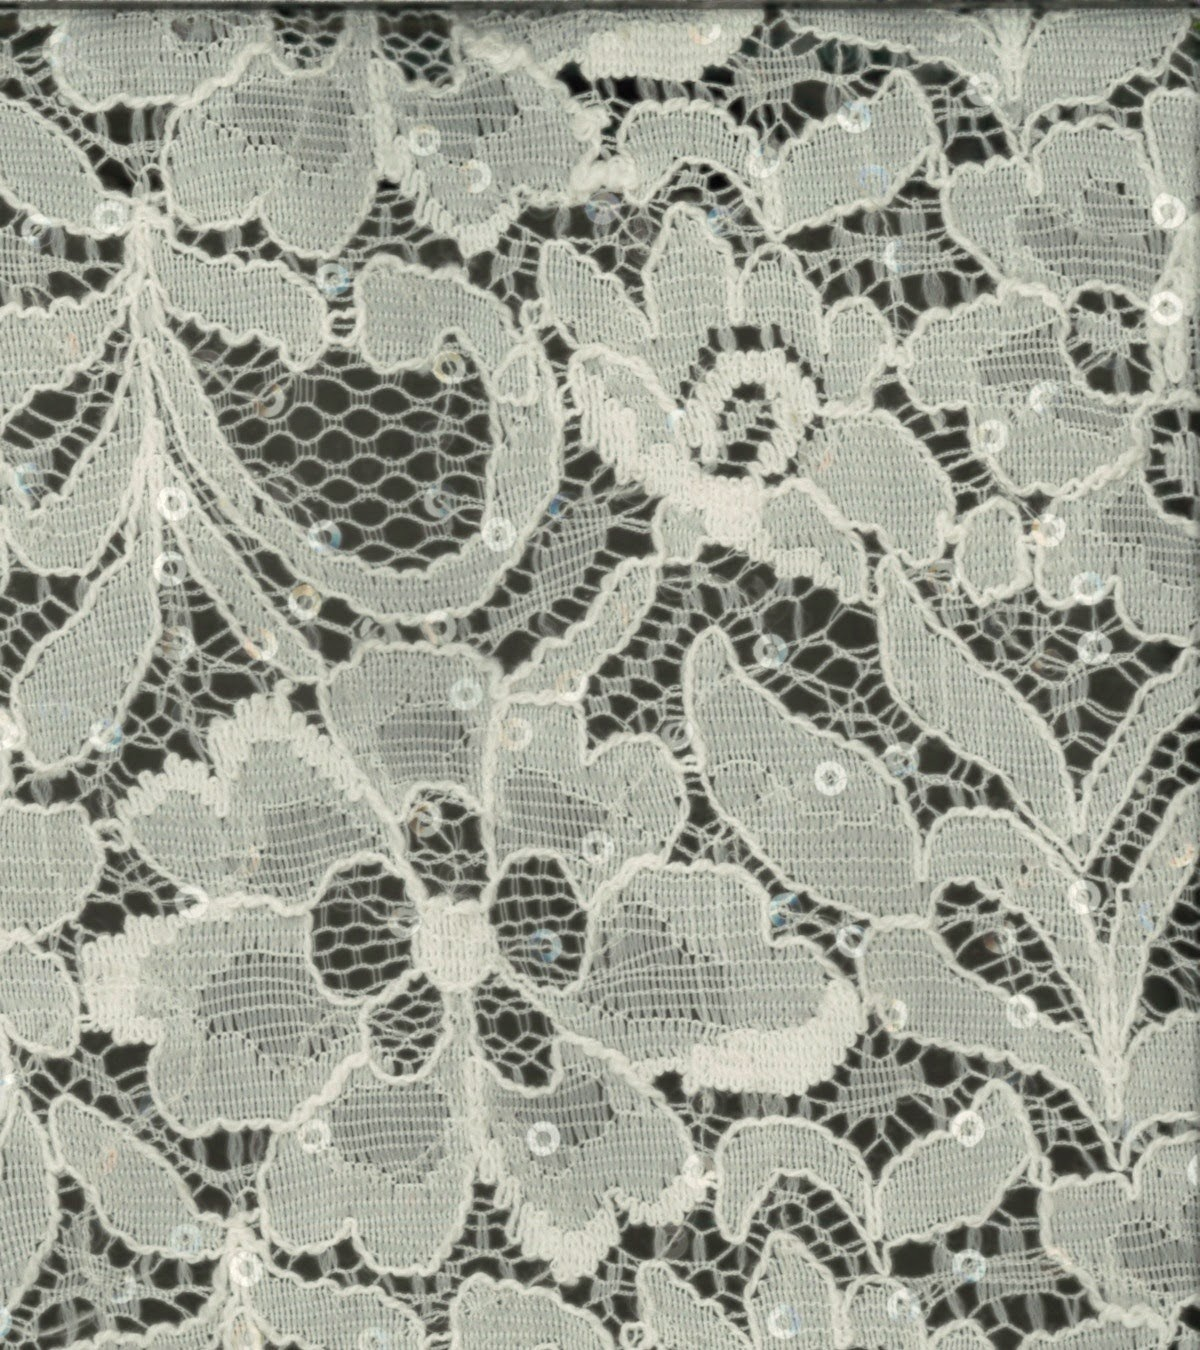 http://www.joann.com/bridal-inspirations-fabric-sequin-lace-ivory/12116406.html#prefv3=Whites&prefn1=isProject&prefn2=isVideo&q=lace&prefn3=refinementColor&prefv2=false&prefv1=false&start=40